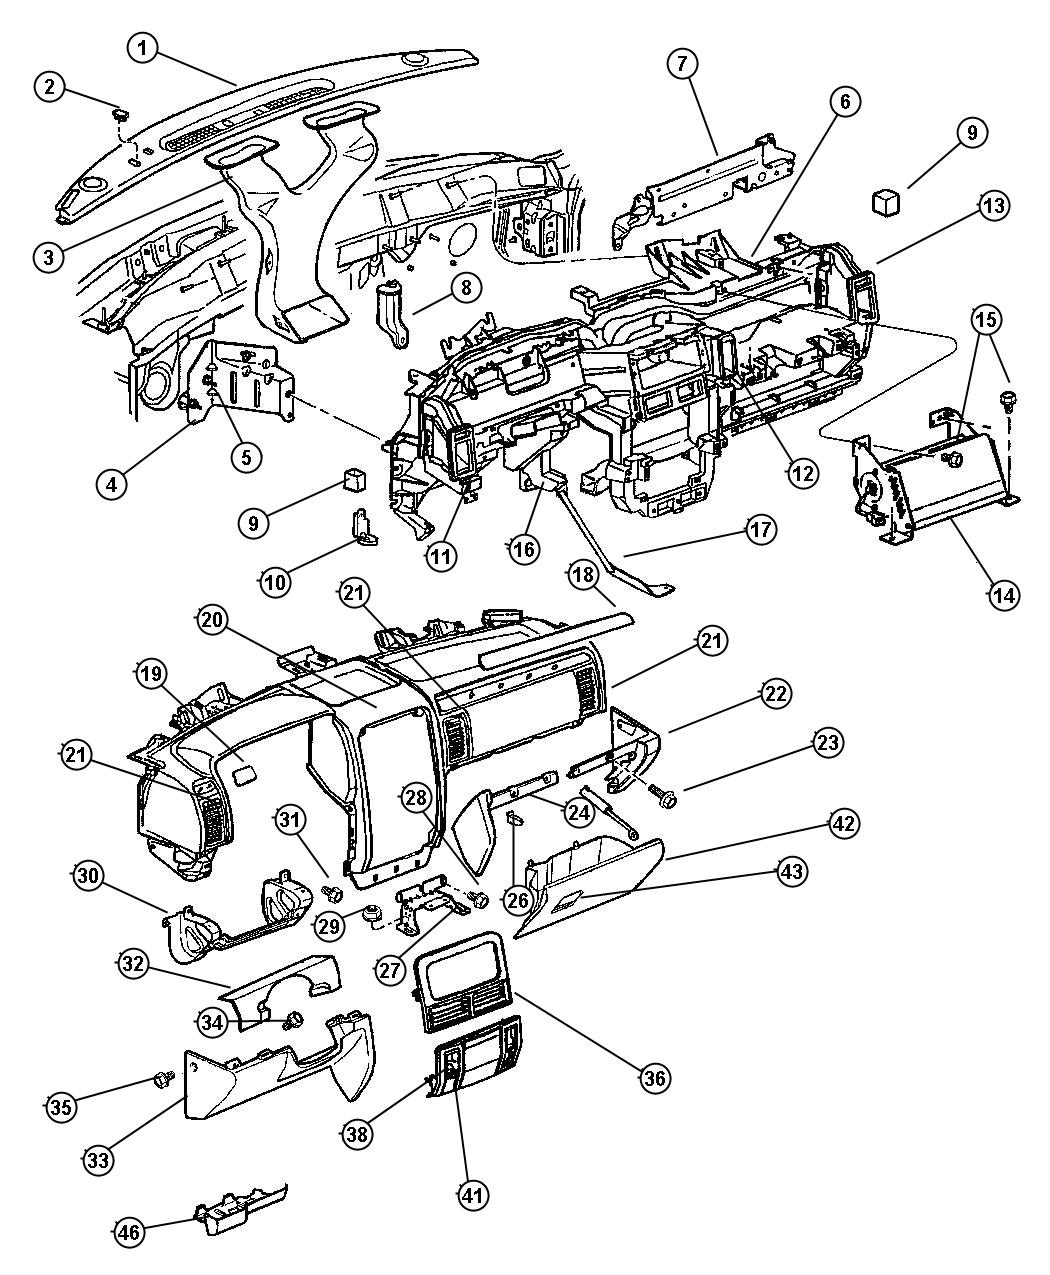 Jeep Grand Cherokee Bezel Driver Instrument Panel